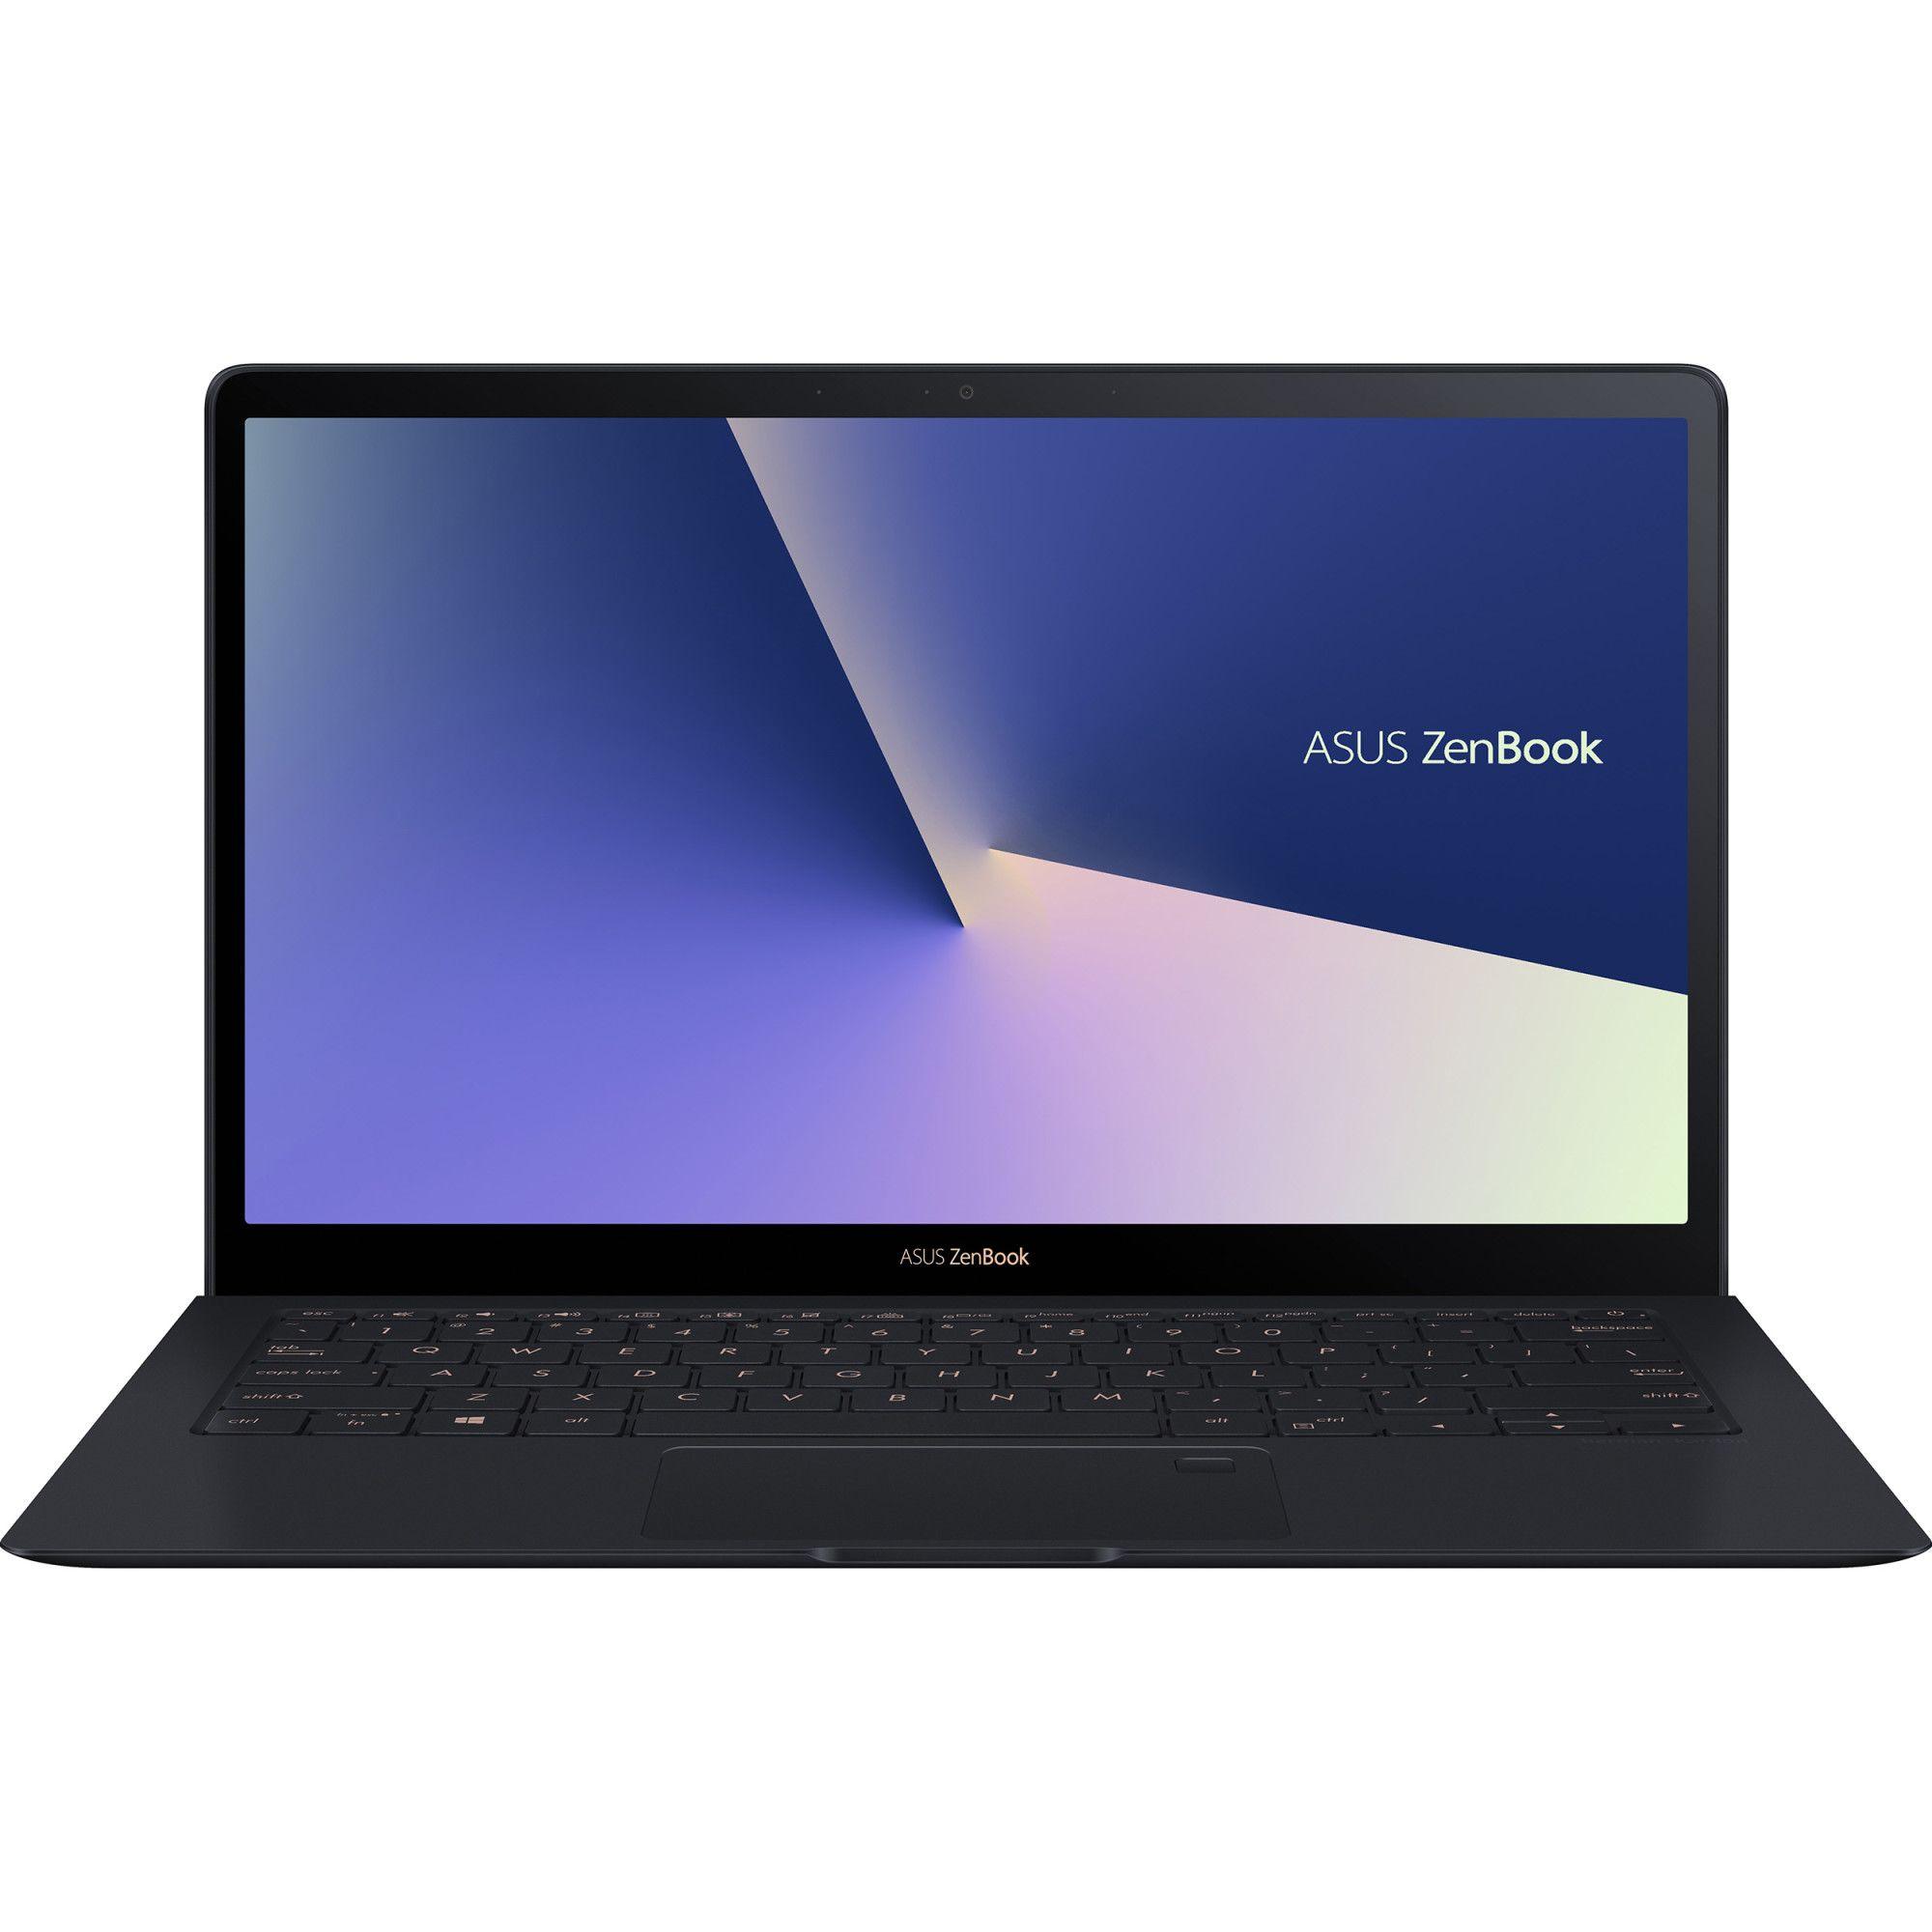 Ultrabook Asus ZenBook S UX391FA 13.3 Full HD Intel Core i7-8565U RAM 16GB SSD 1TB Windows 10 Pro Albastru